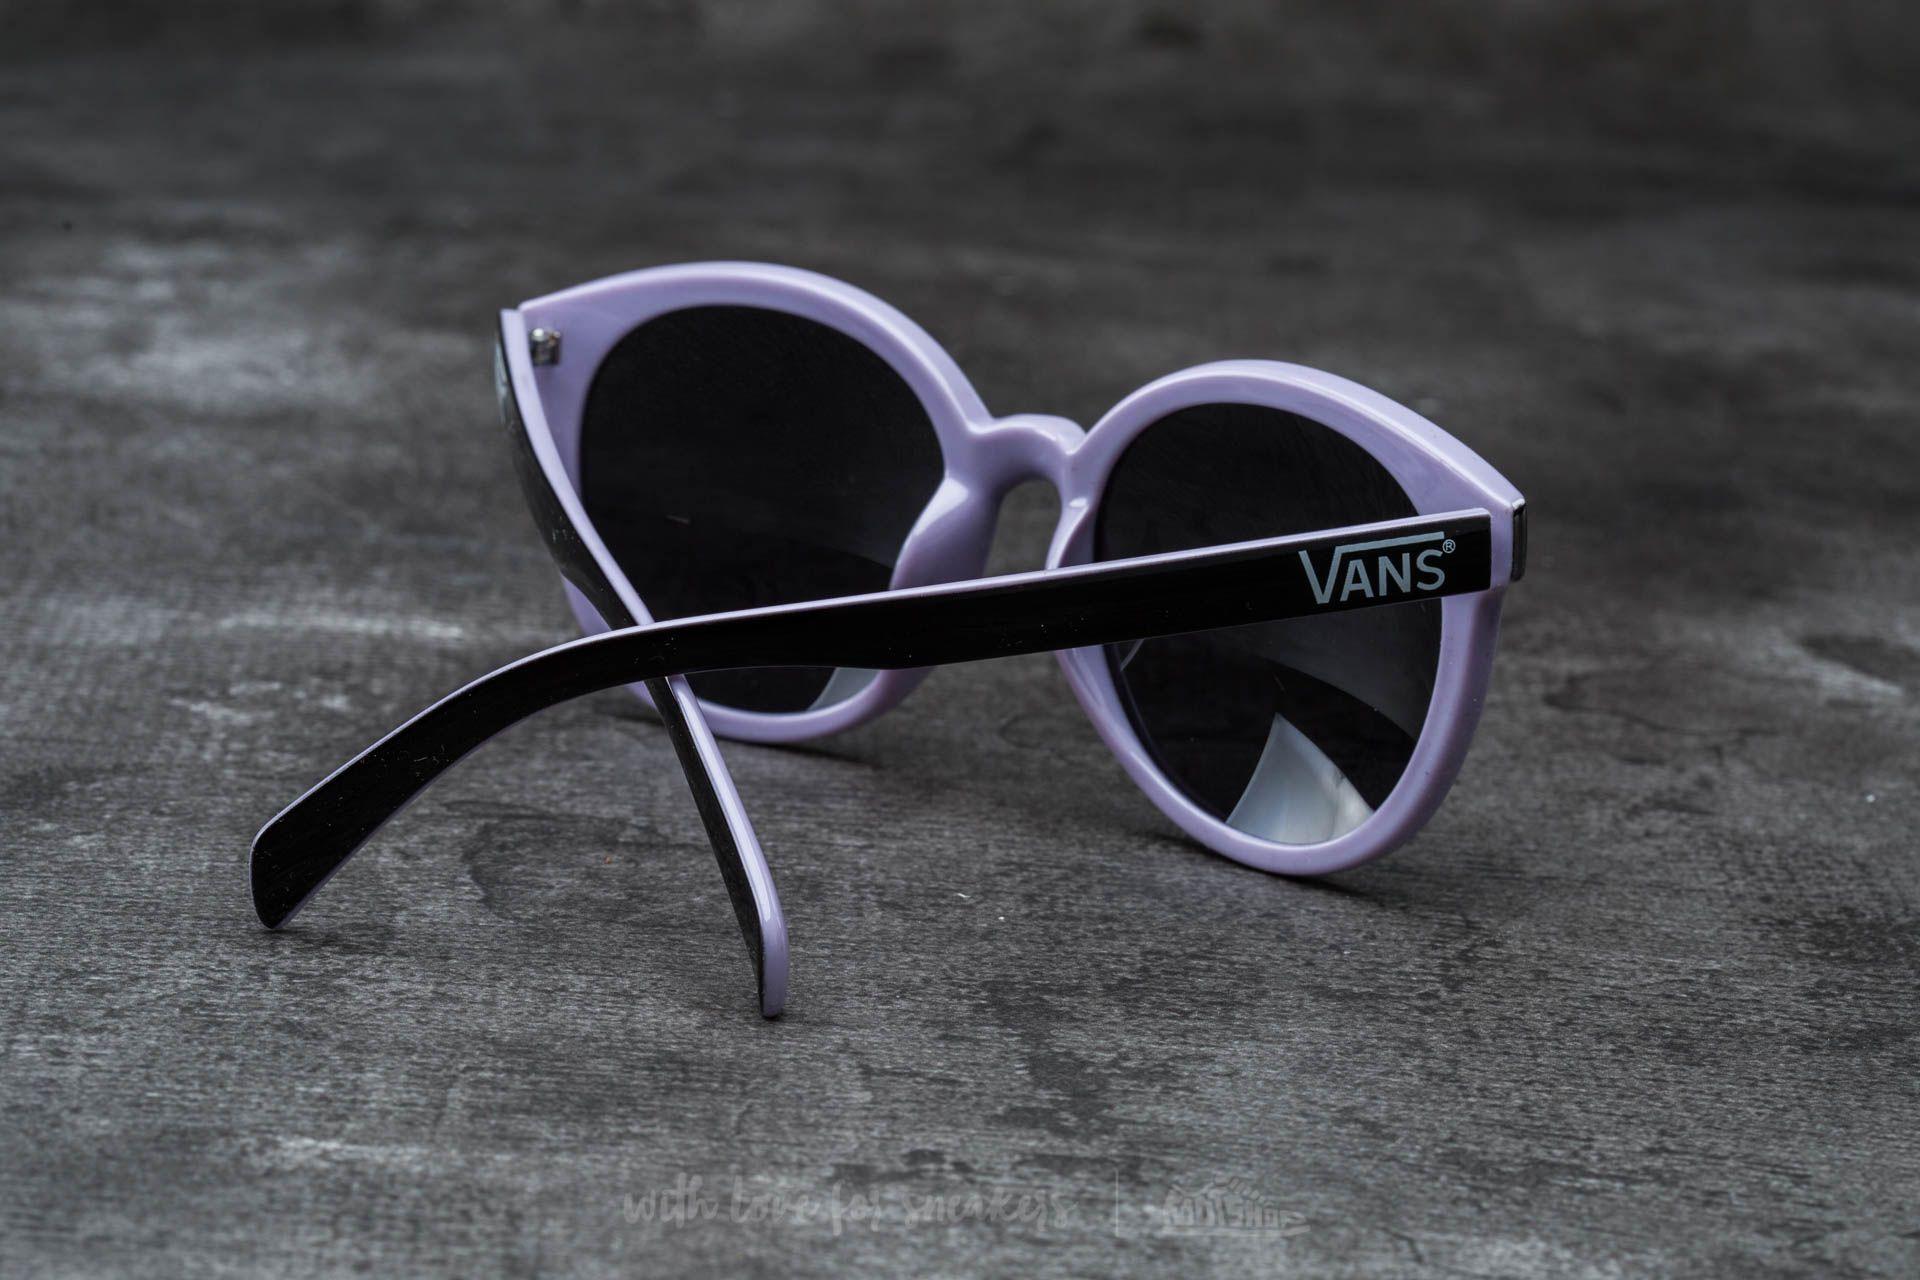 LavenderFootshop Sunglasses Vans Kapela Kapela Black Vans Xn08PkwO